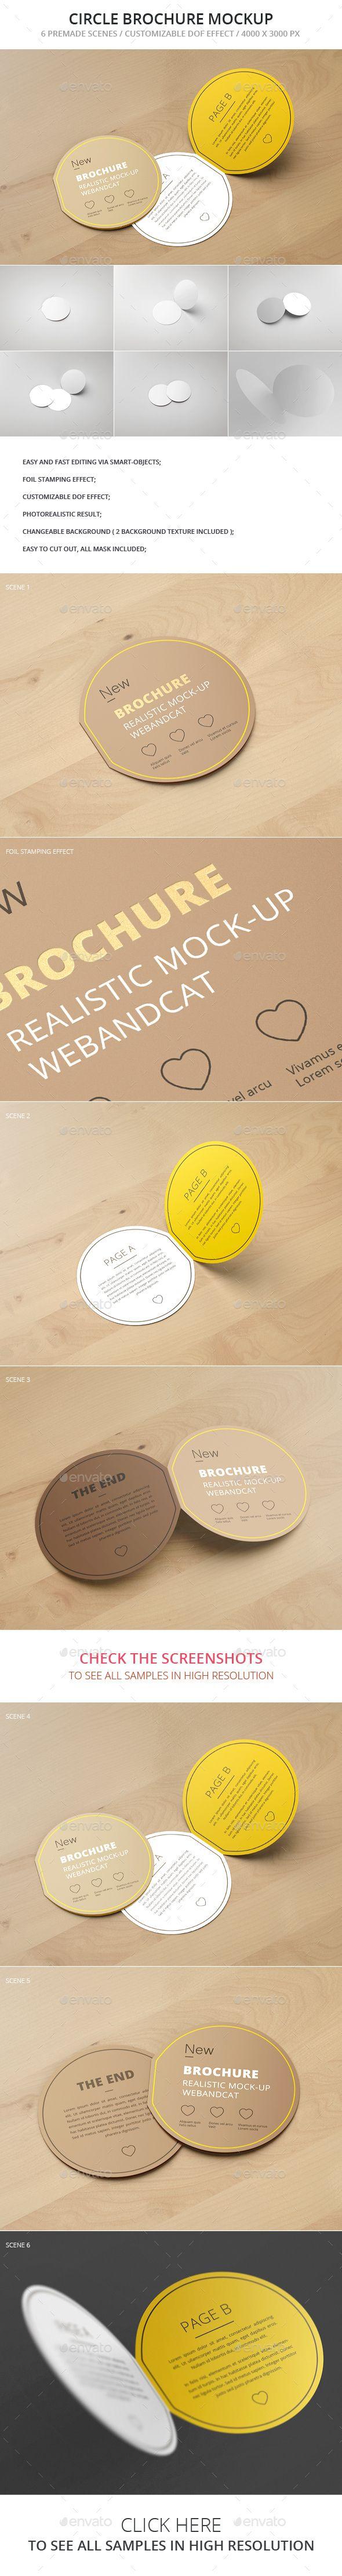 Circle Bi Fold Brochure Mockup